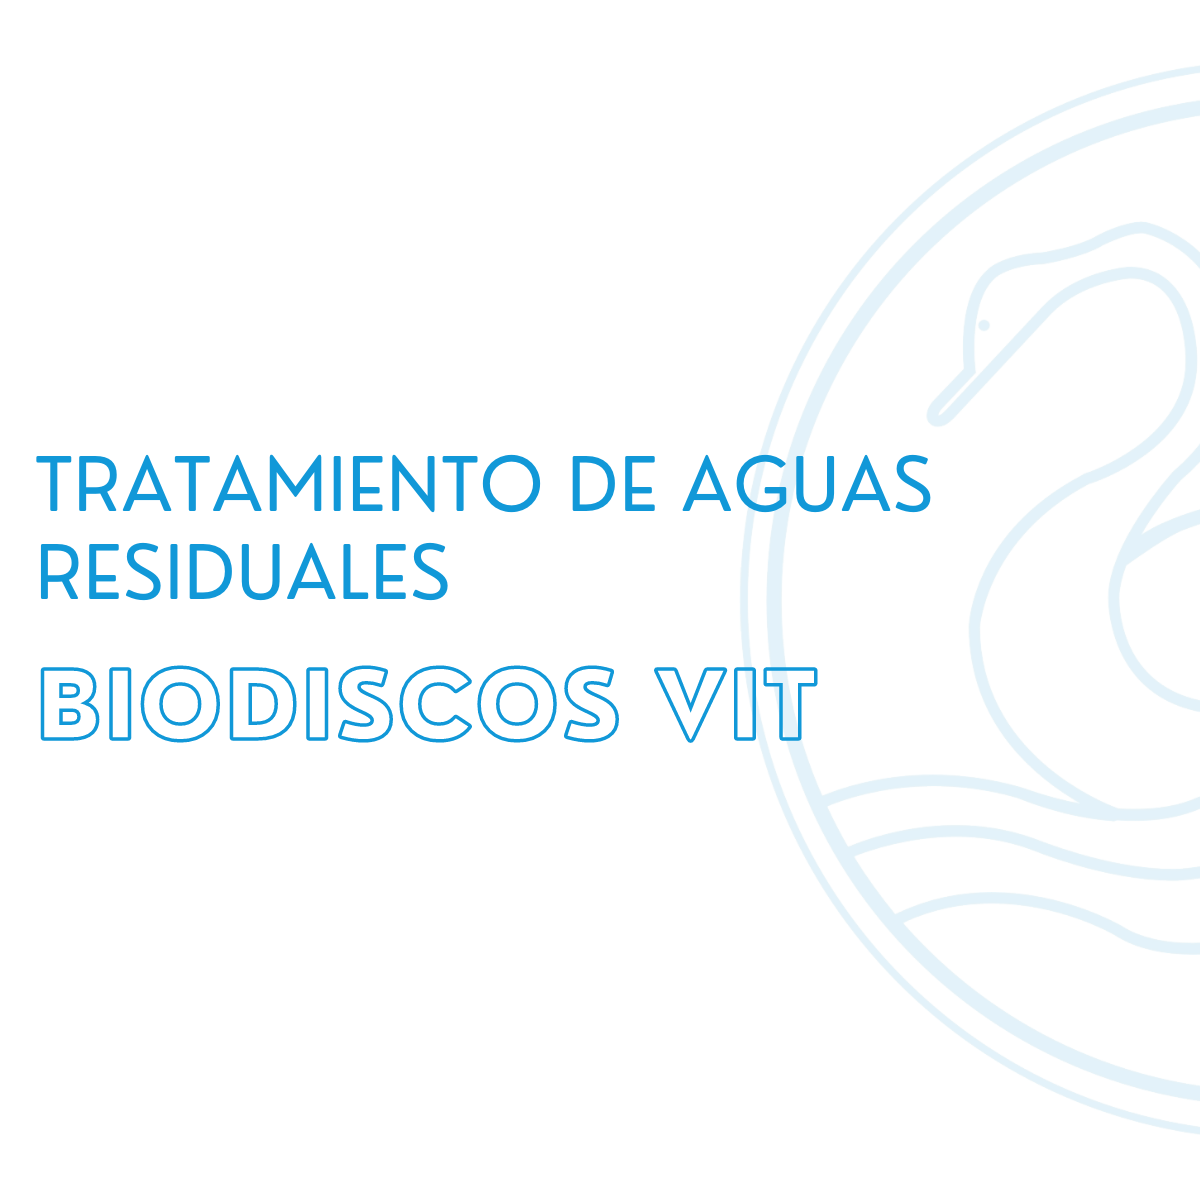 Biodiscos VIT